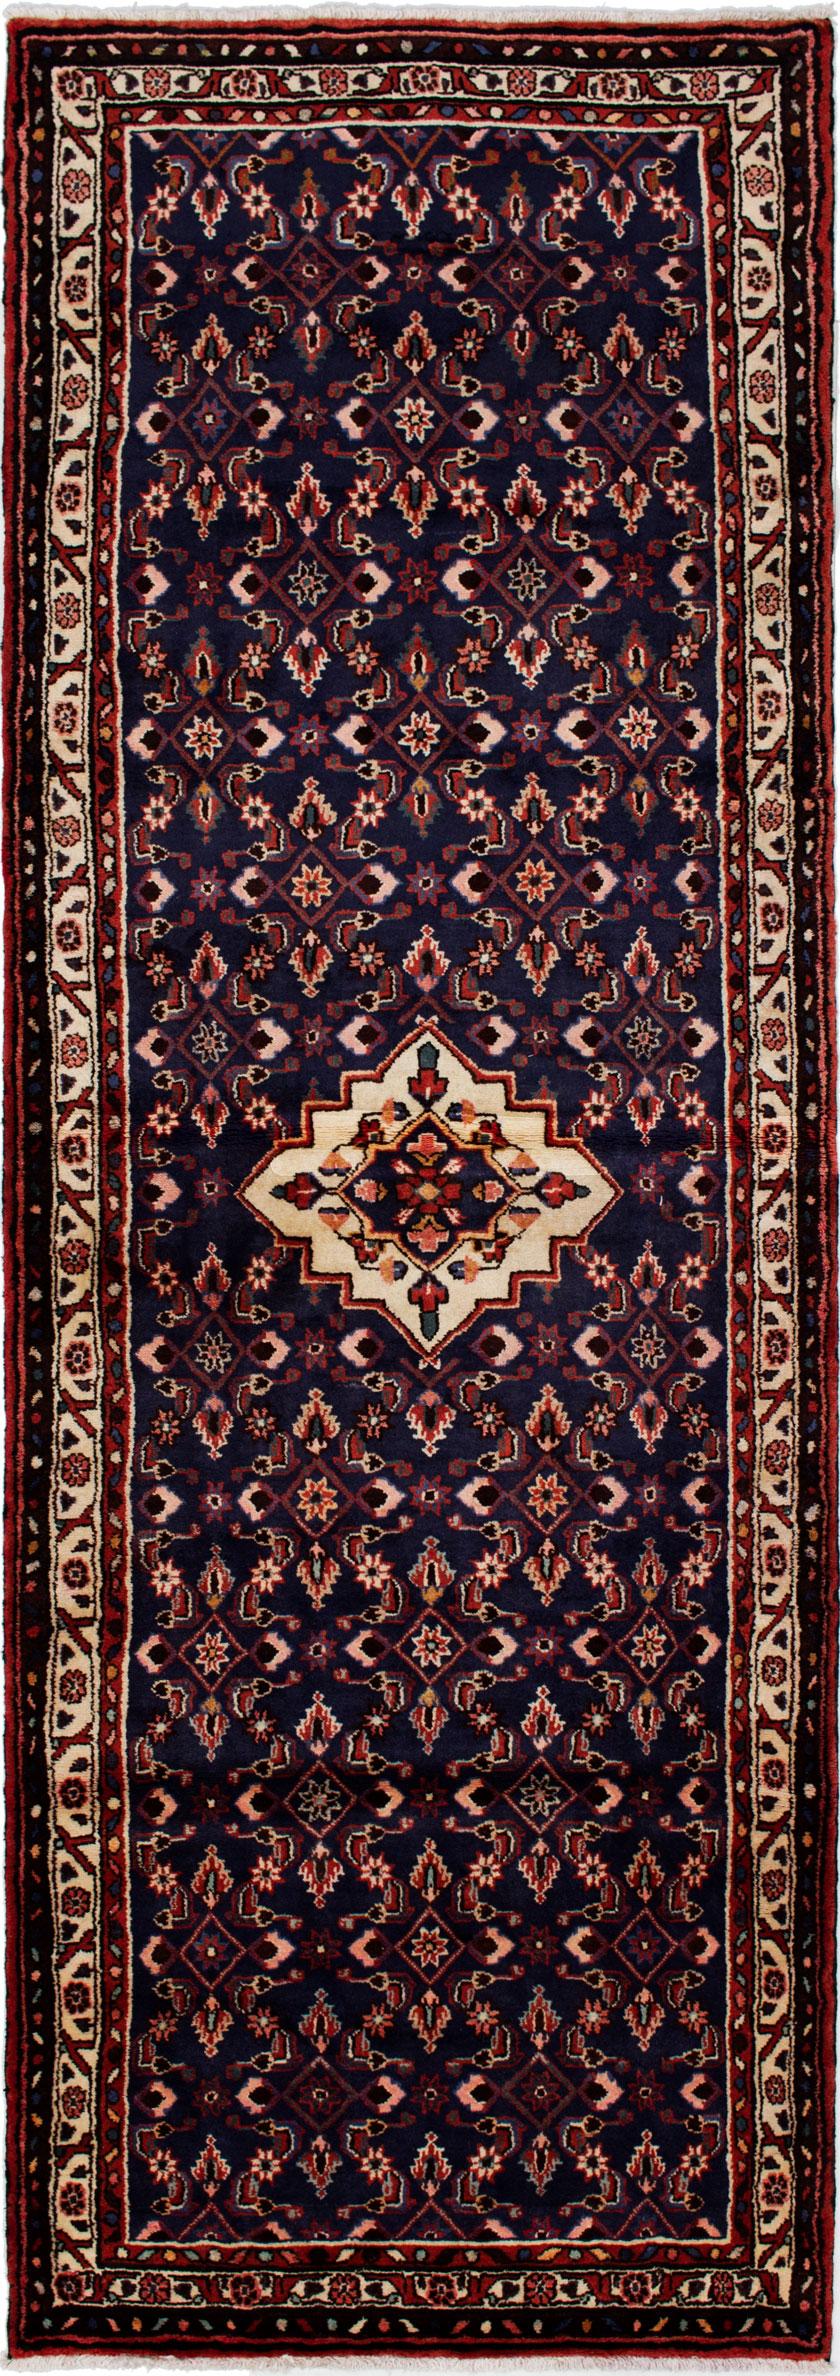 "Hand-knotted Hamadan Dark Blue Wool Rug 3'7"" x 10'4"" Size: 3'7"" x 10'4"""